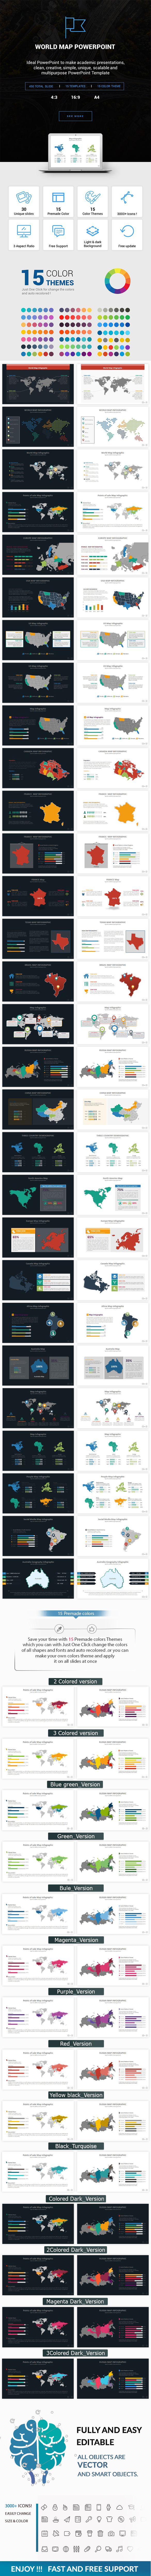 World Map PowerPoint Presentation Template - Business PowerPoint Templates